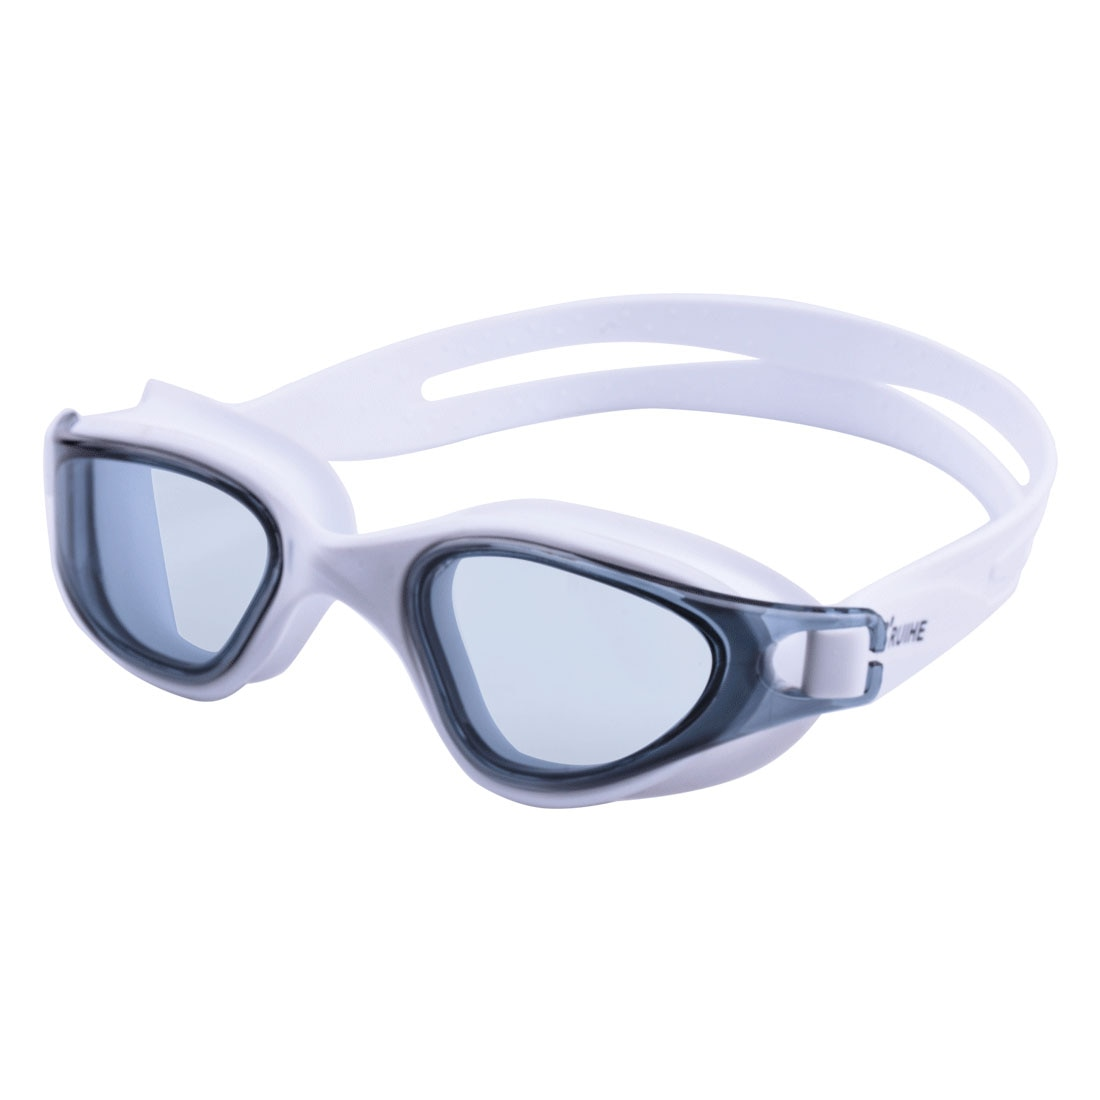 AliExpress - Swimming Glasses Swim Goggles Professional Anti-Fog UV Protection for Men Women Adults Kids Waterproof Swimwear Diving Eyewear